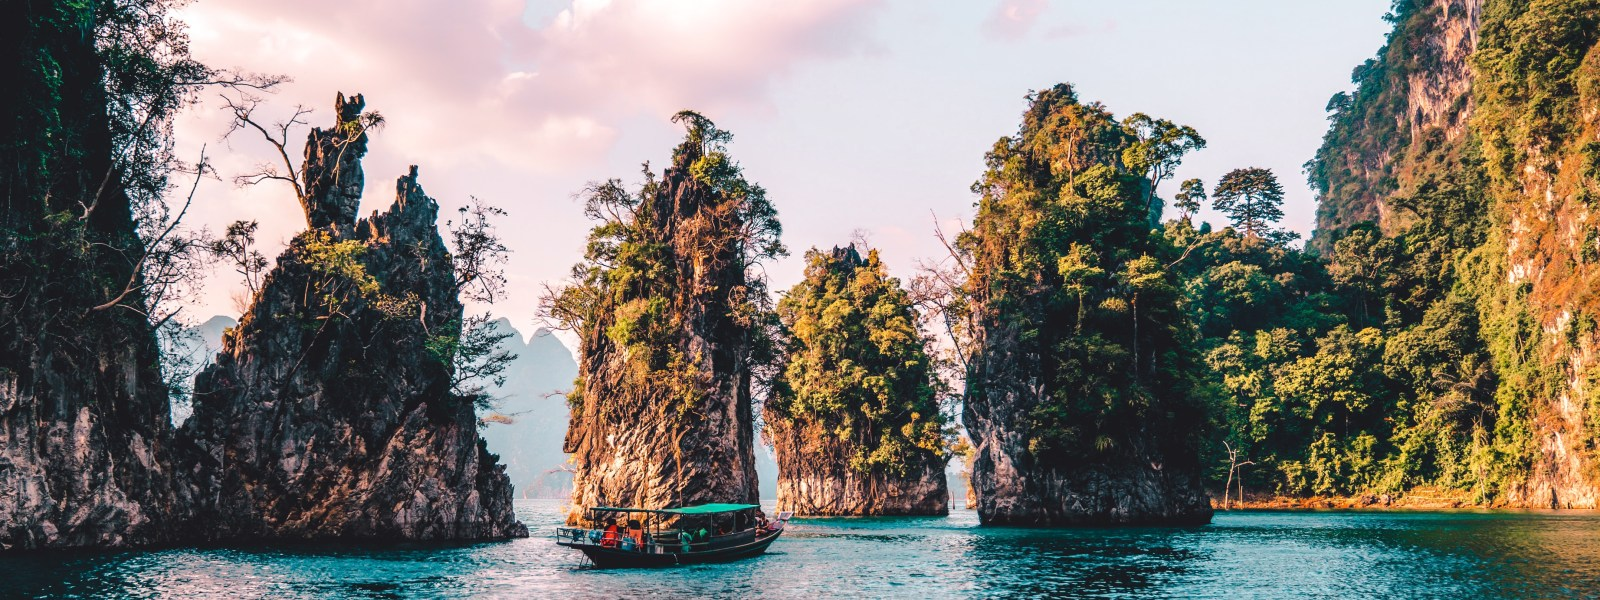 My wish list for a third Thailand trip